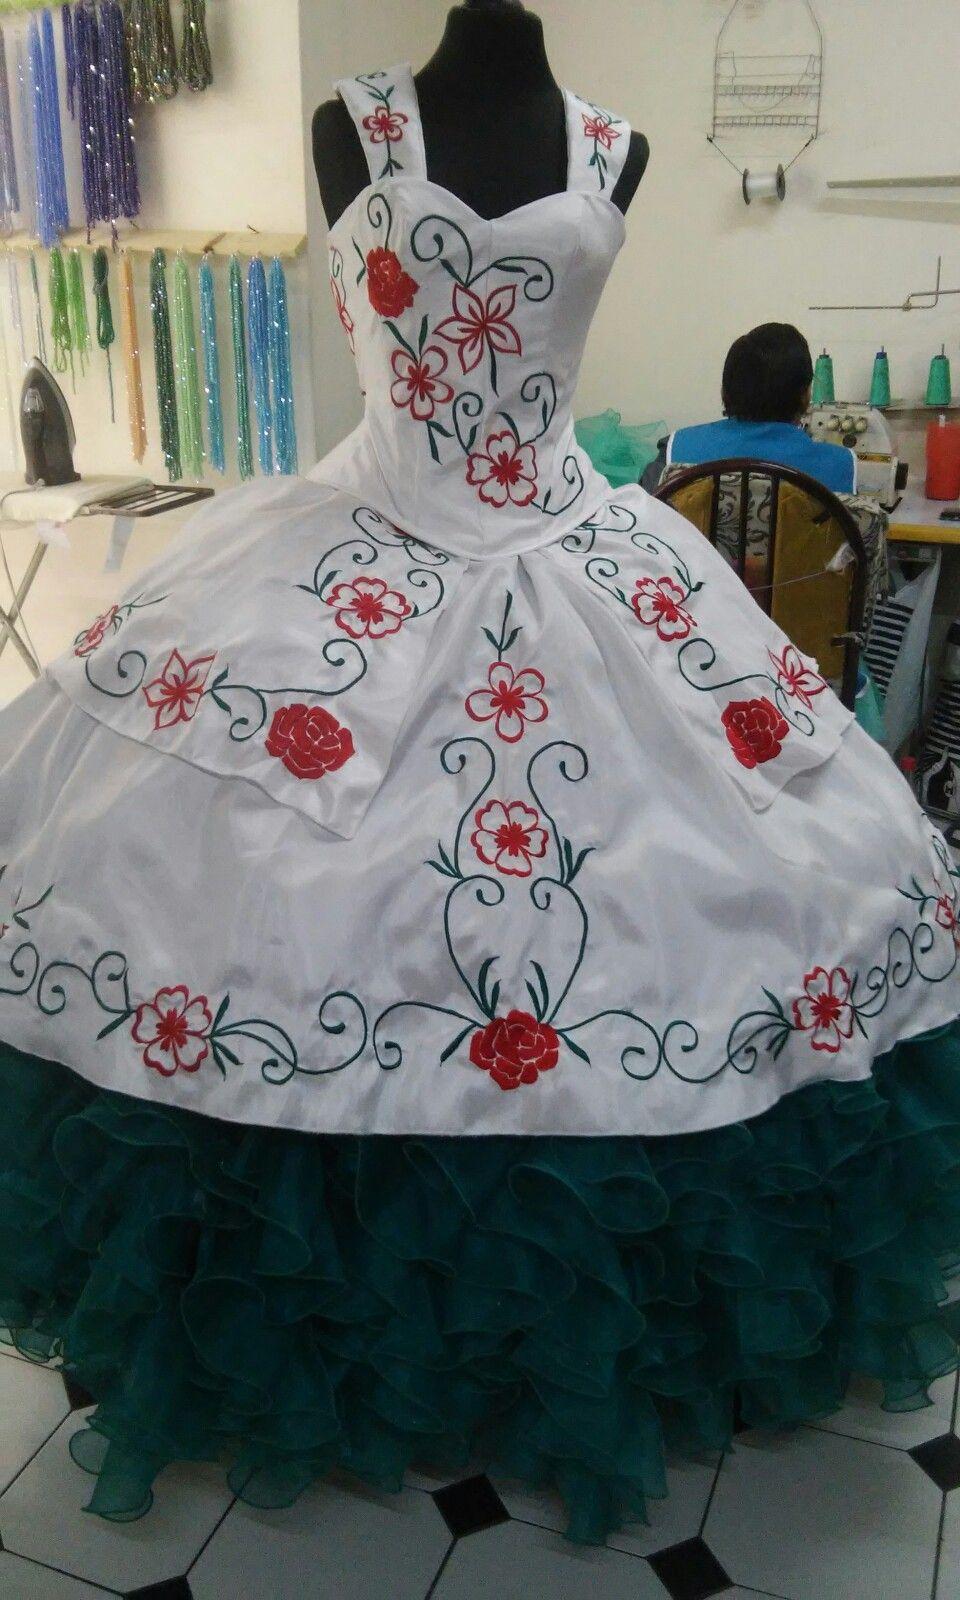 custom design quinceanera dress,custom make your quinceanera dress,white quinceanera dress,removable sleeves quinceanera dress,embroidery quinceanera dress,quinceanera dress wholesale suppliers,inexpensive quinceanera dress,floral embroidery quinceanera dress,chinese quinceanera dress factory,